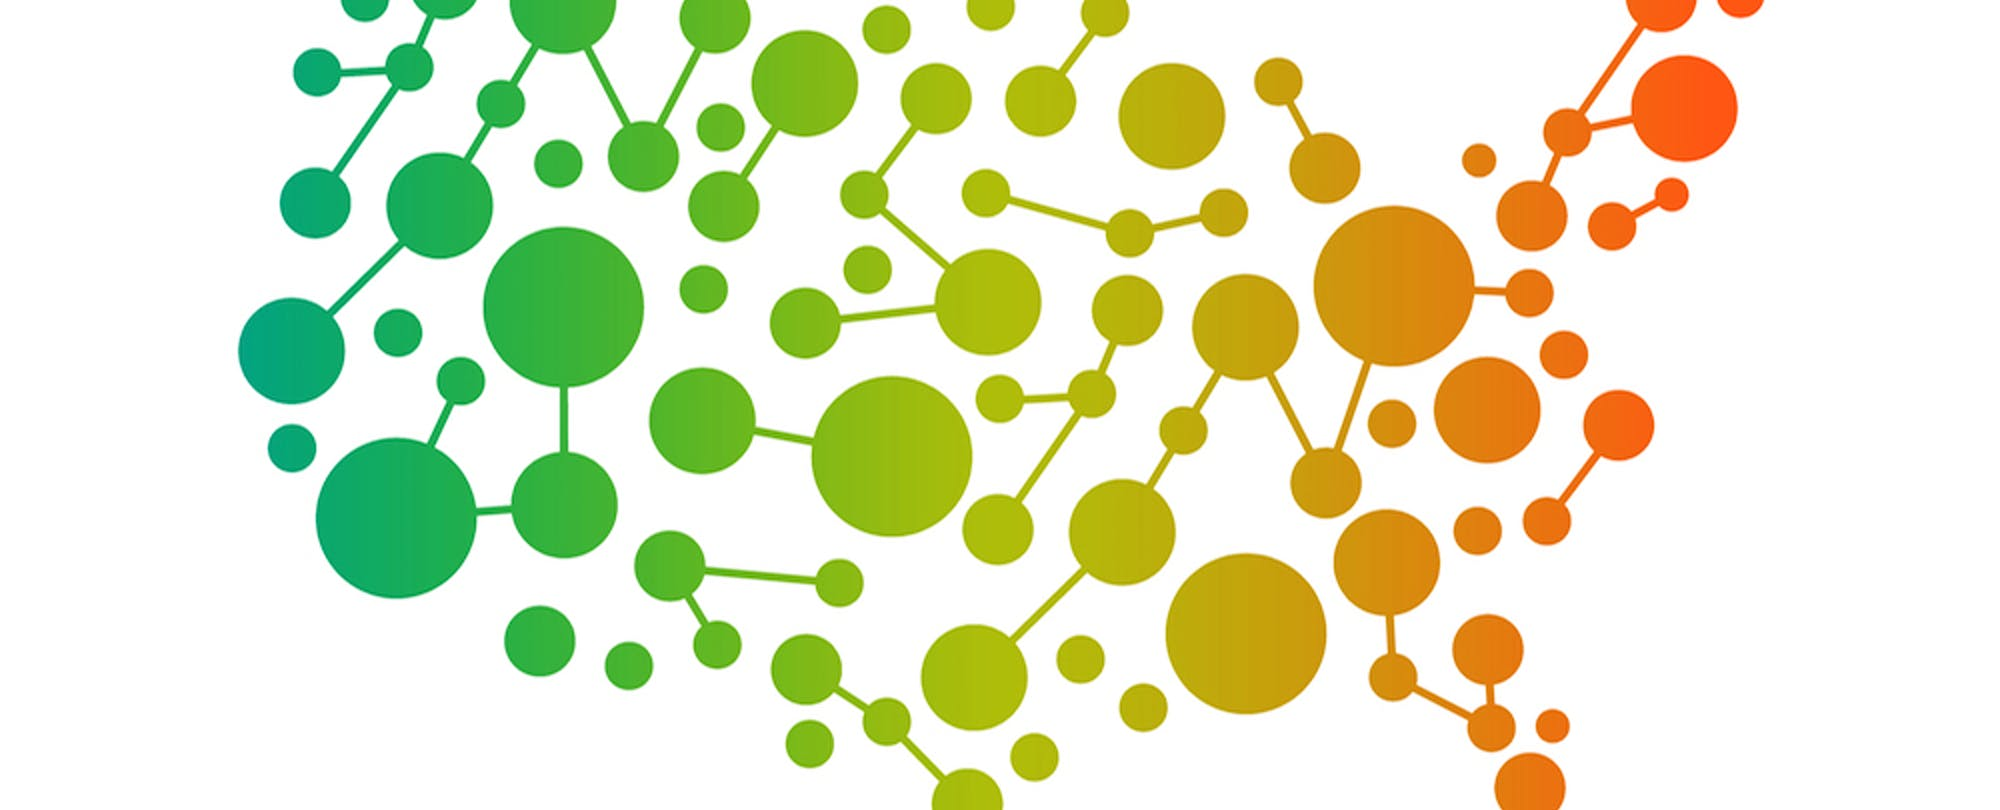 Connect the Dots: How Michigan, Arizona and Portland Make Data Work Together